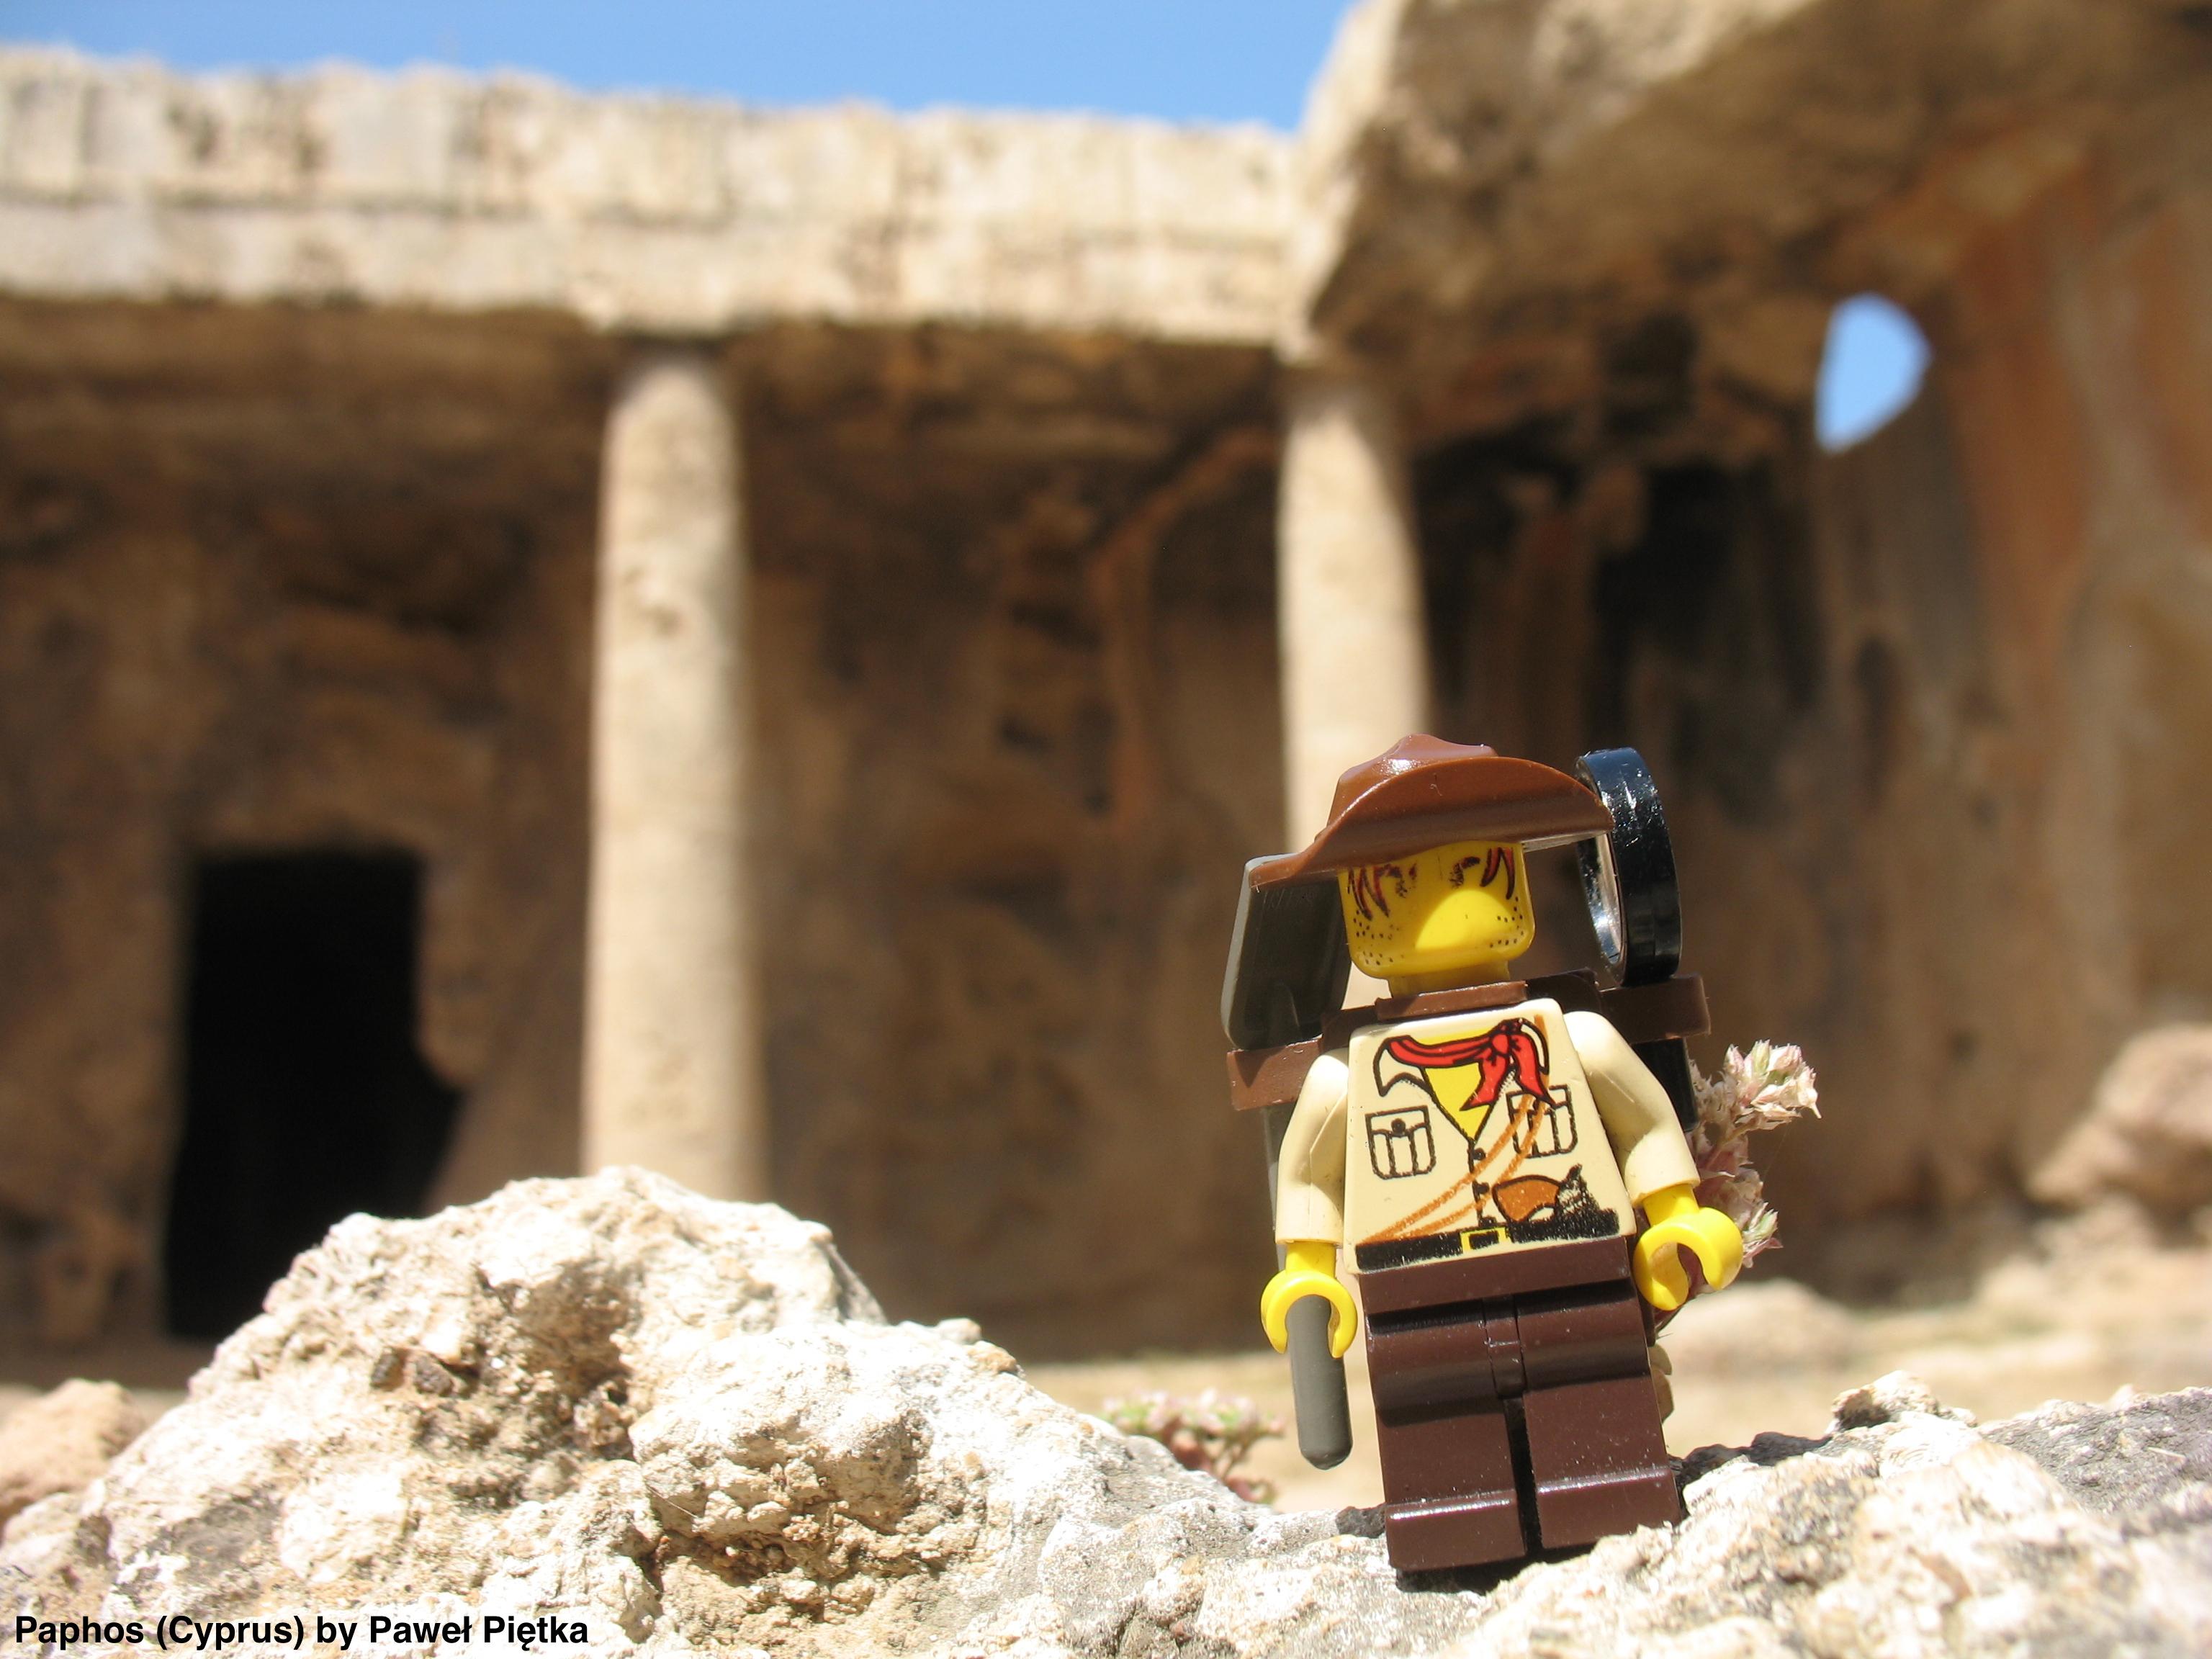 Paphos (Cyprus) - Tombs of the Kings